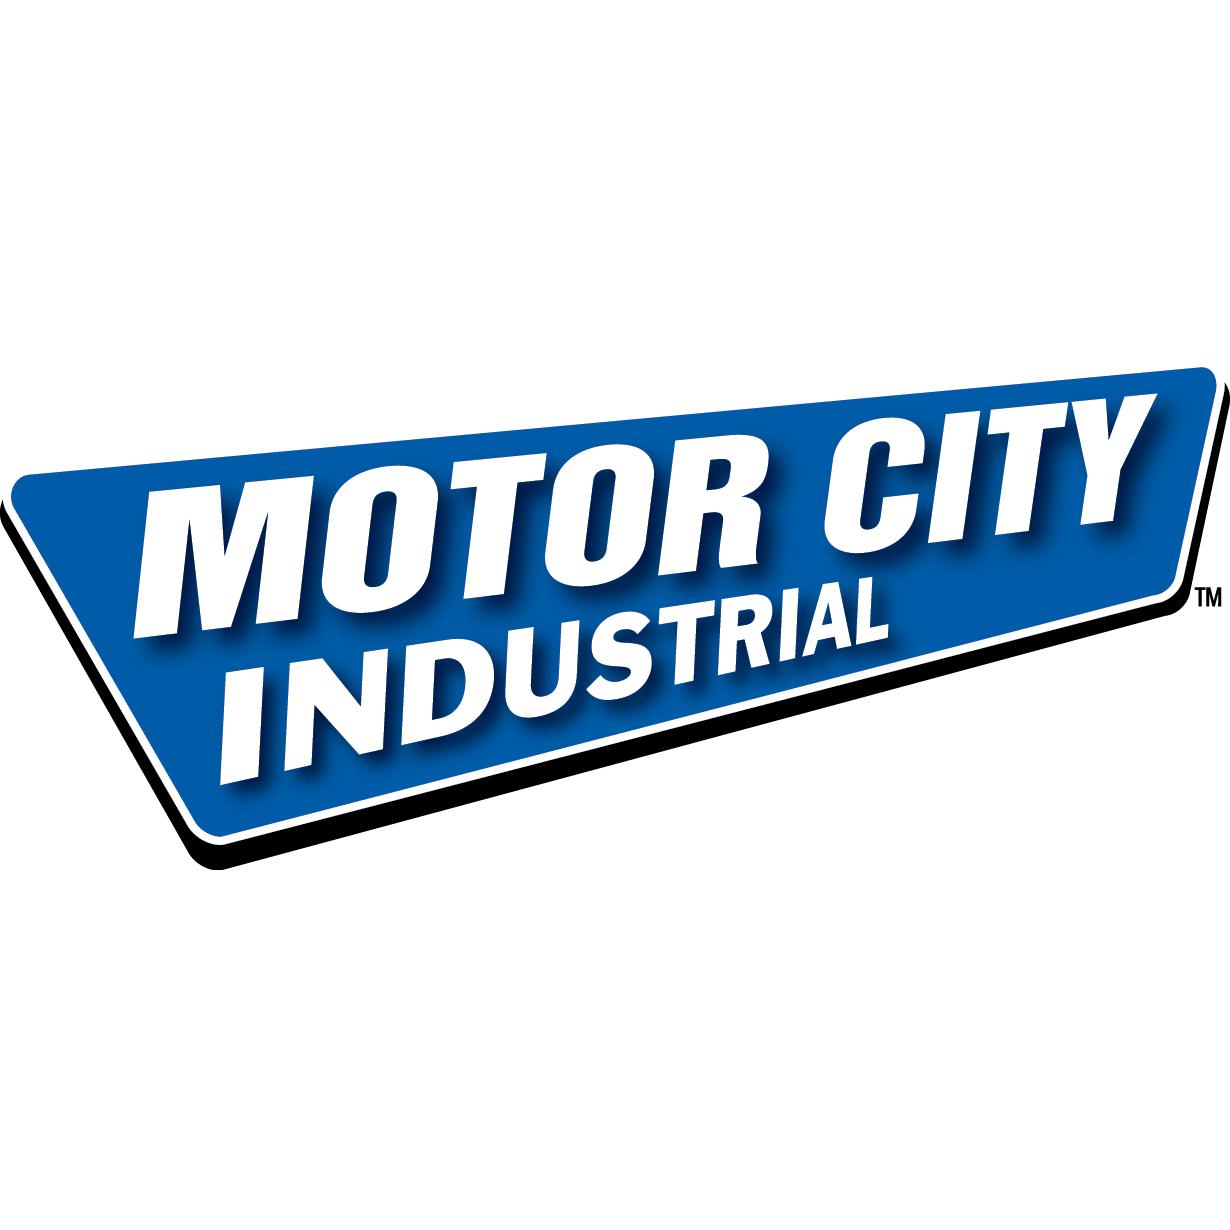 Motor City Industrial